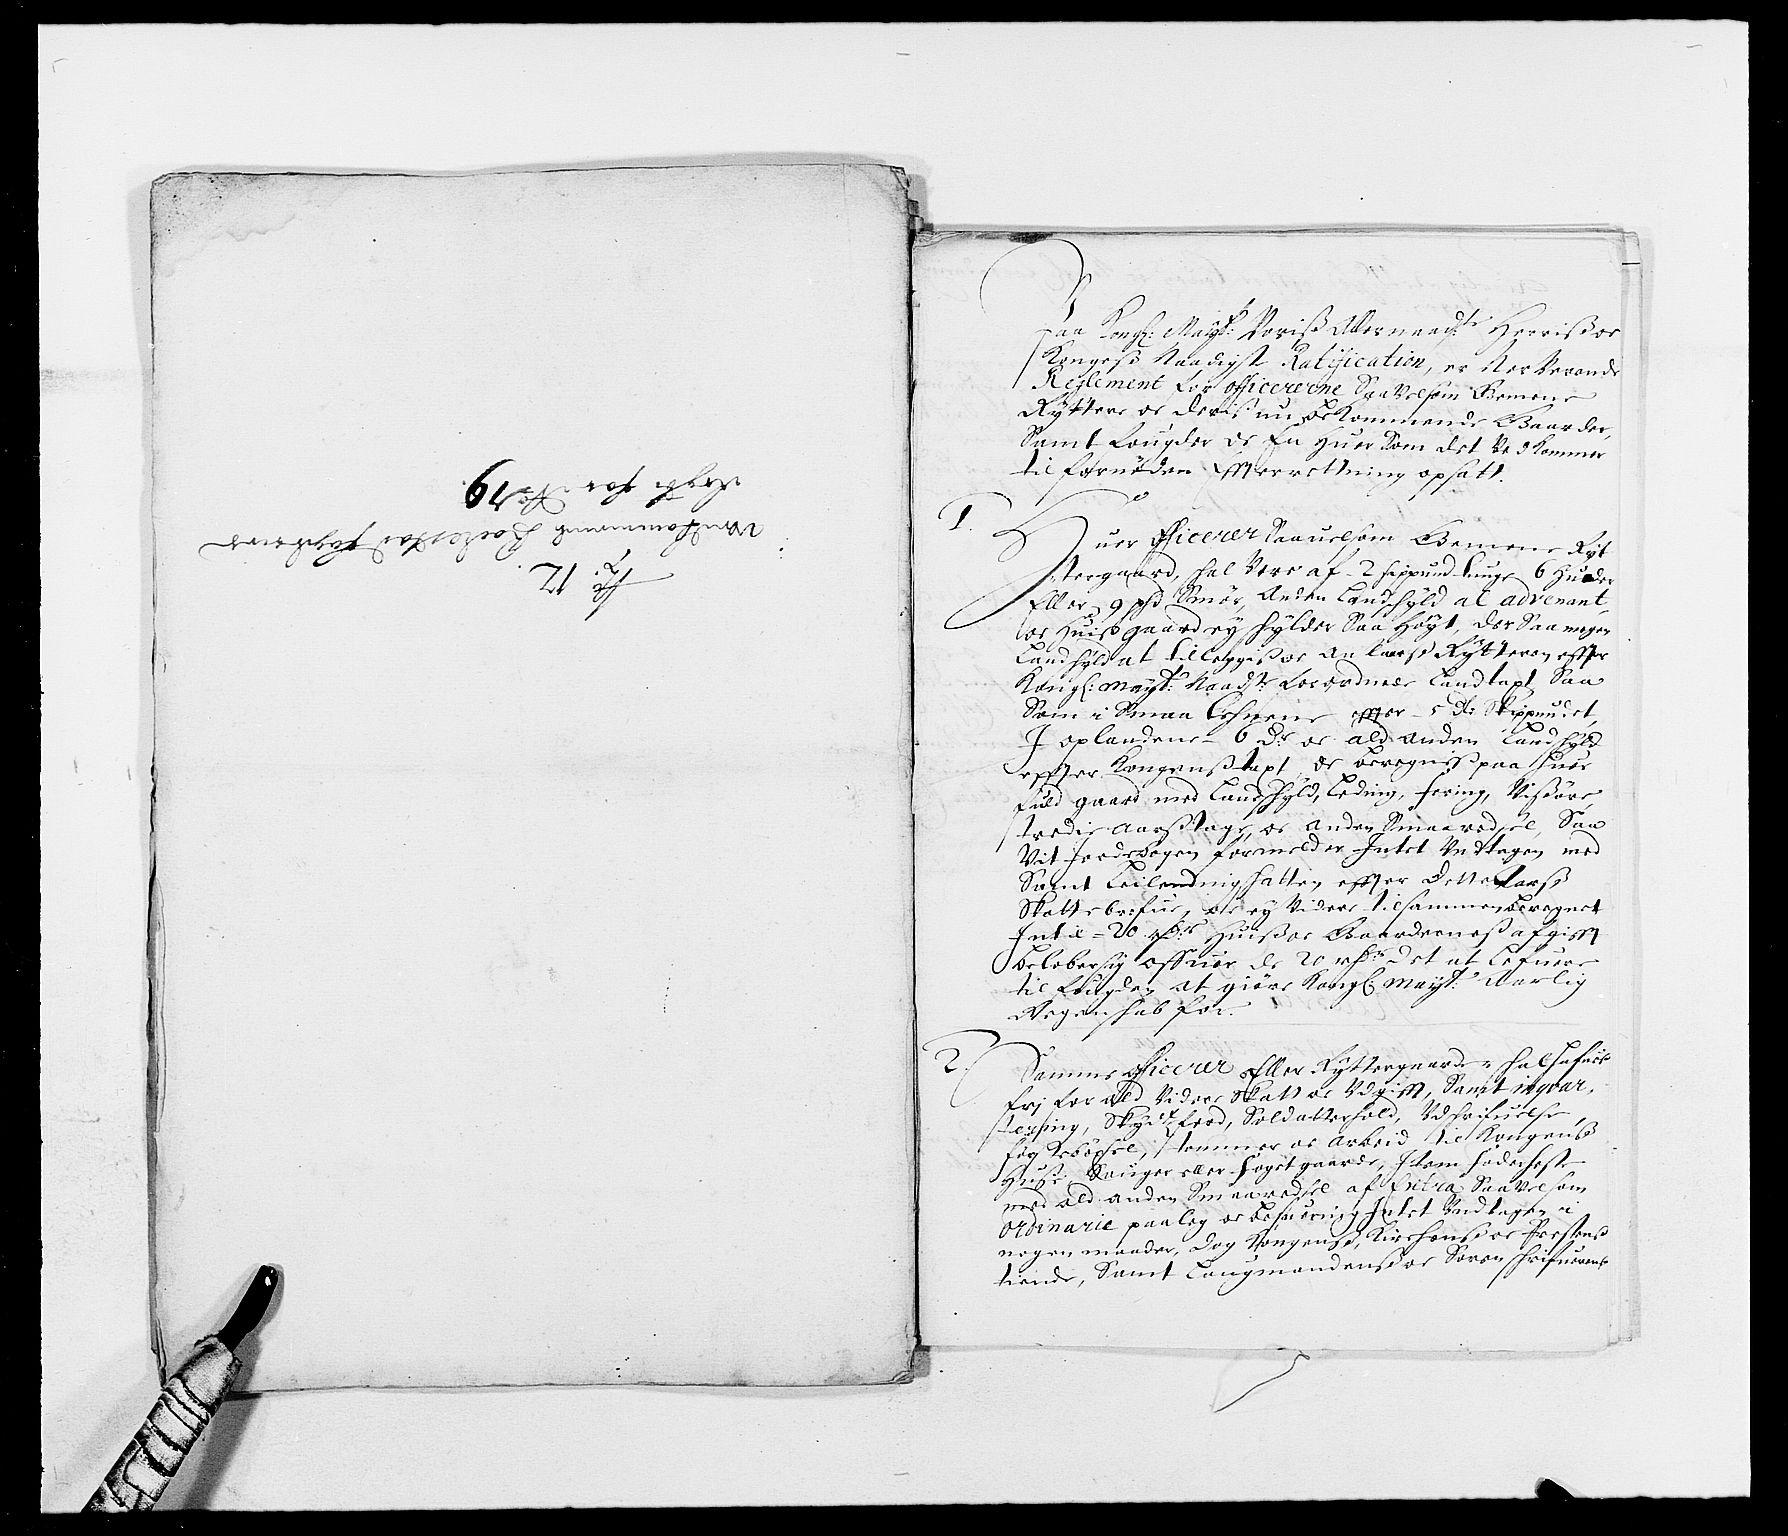 RA, Rentekammeret inntil 1814, Reviderte regnskaper, Fogderegnskap, R05/L0271: Fogderegnskap Rakkestad, 1678-1679, s. 539